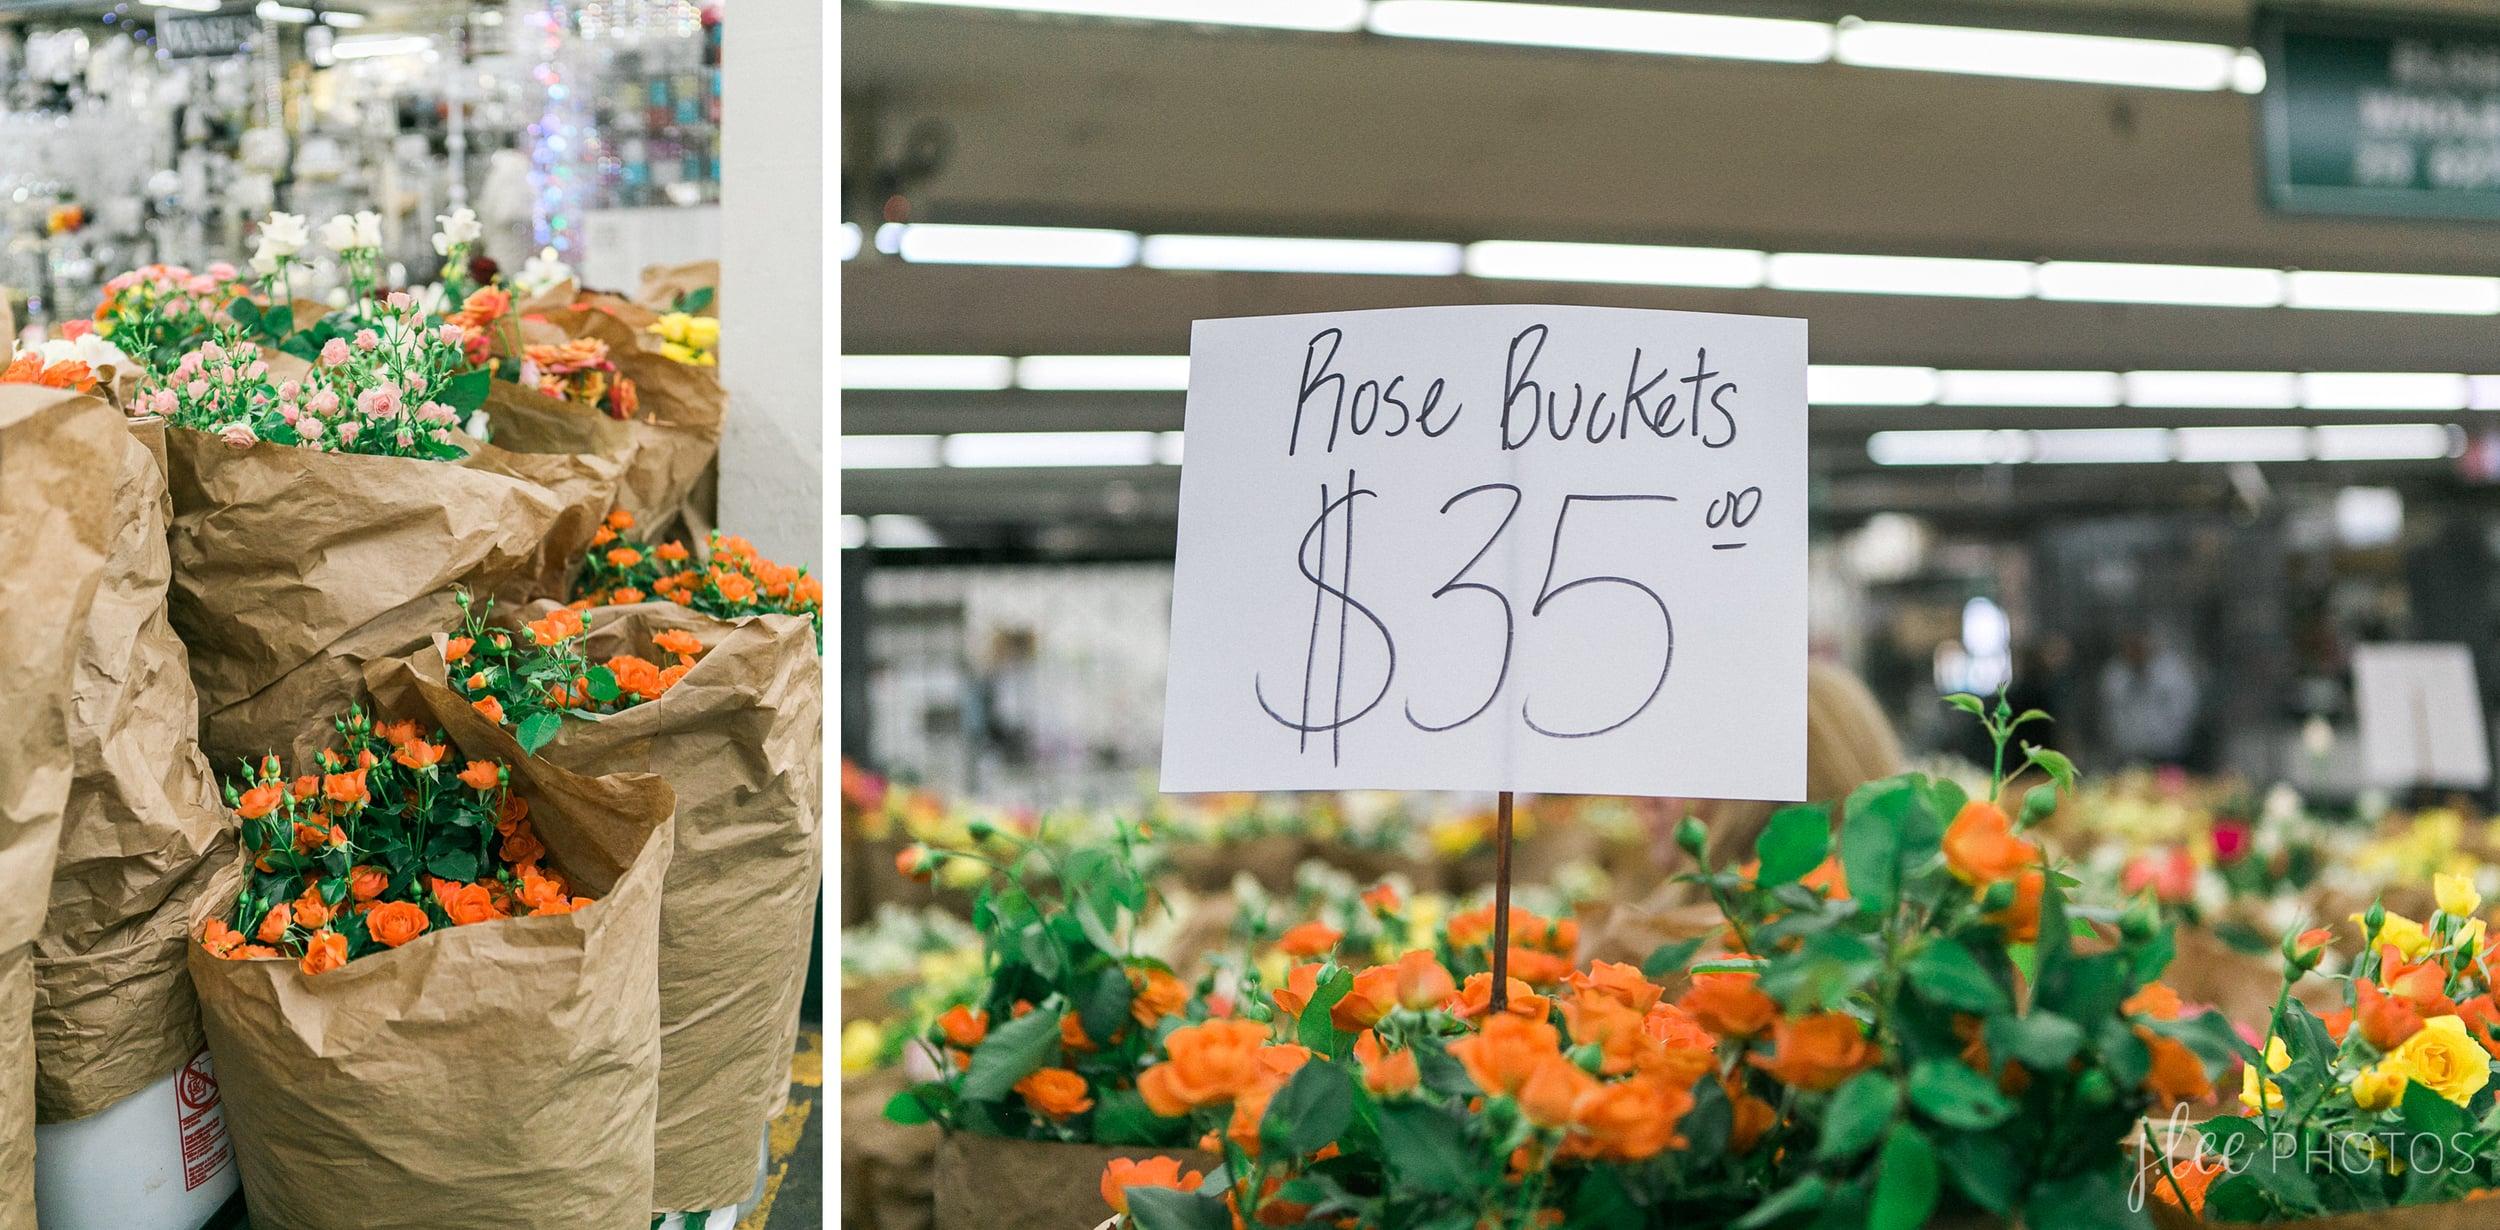 Los Angeles Mart Flower Bucket